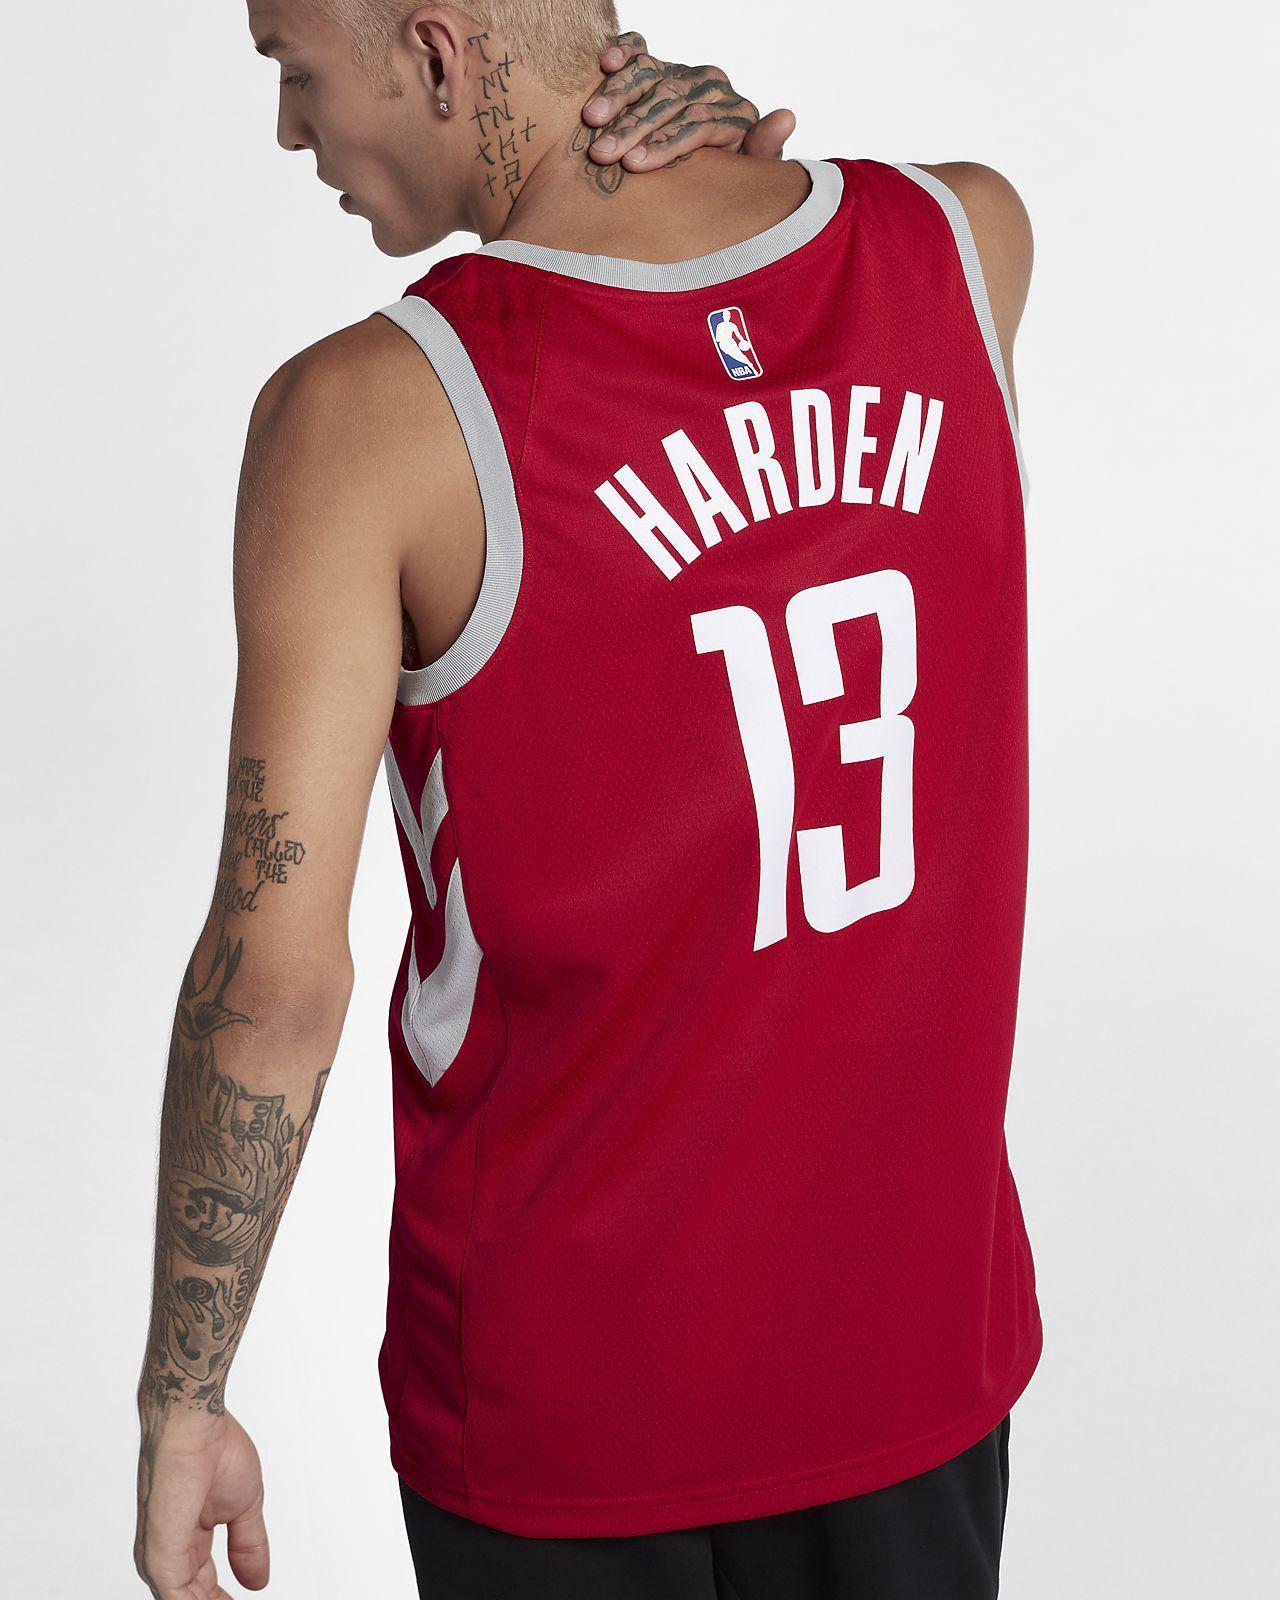 the best attitude 92aaf a7af0 Nike James Harden Houston Rockets Icon Edition Swingman Jersey Men s Nba -  2Xl (56) Silver